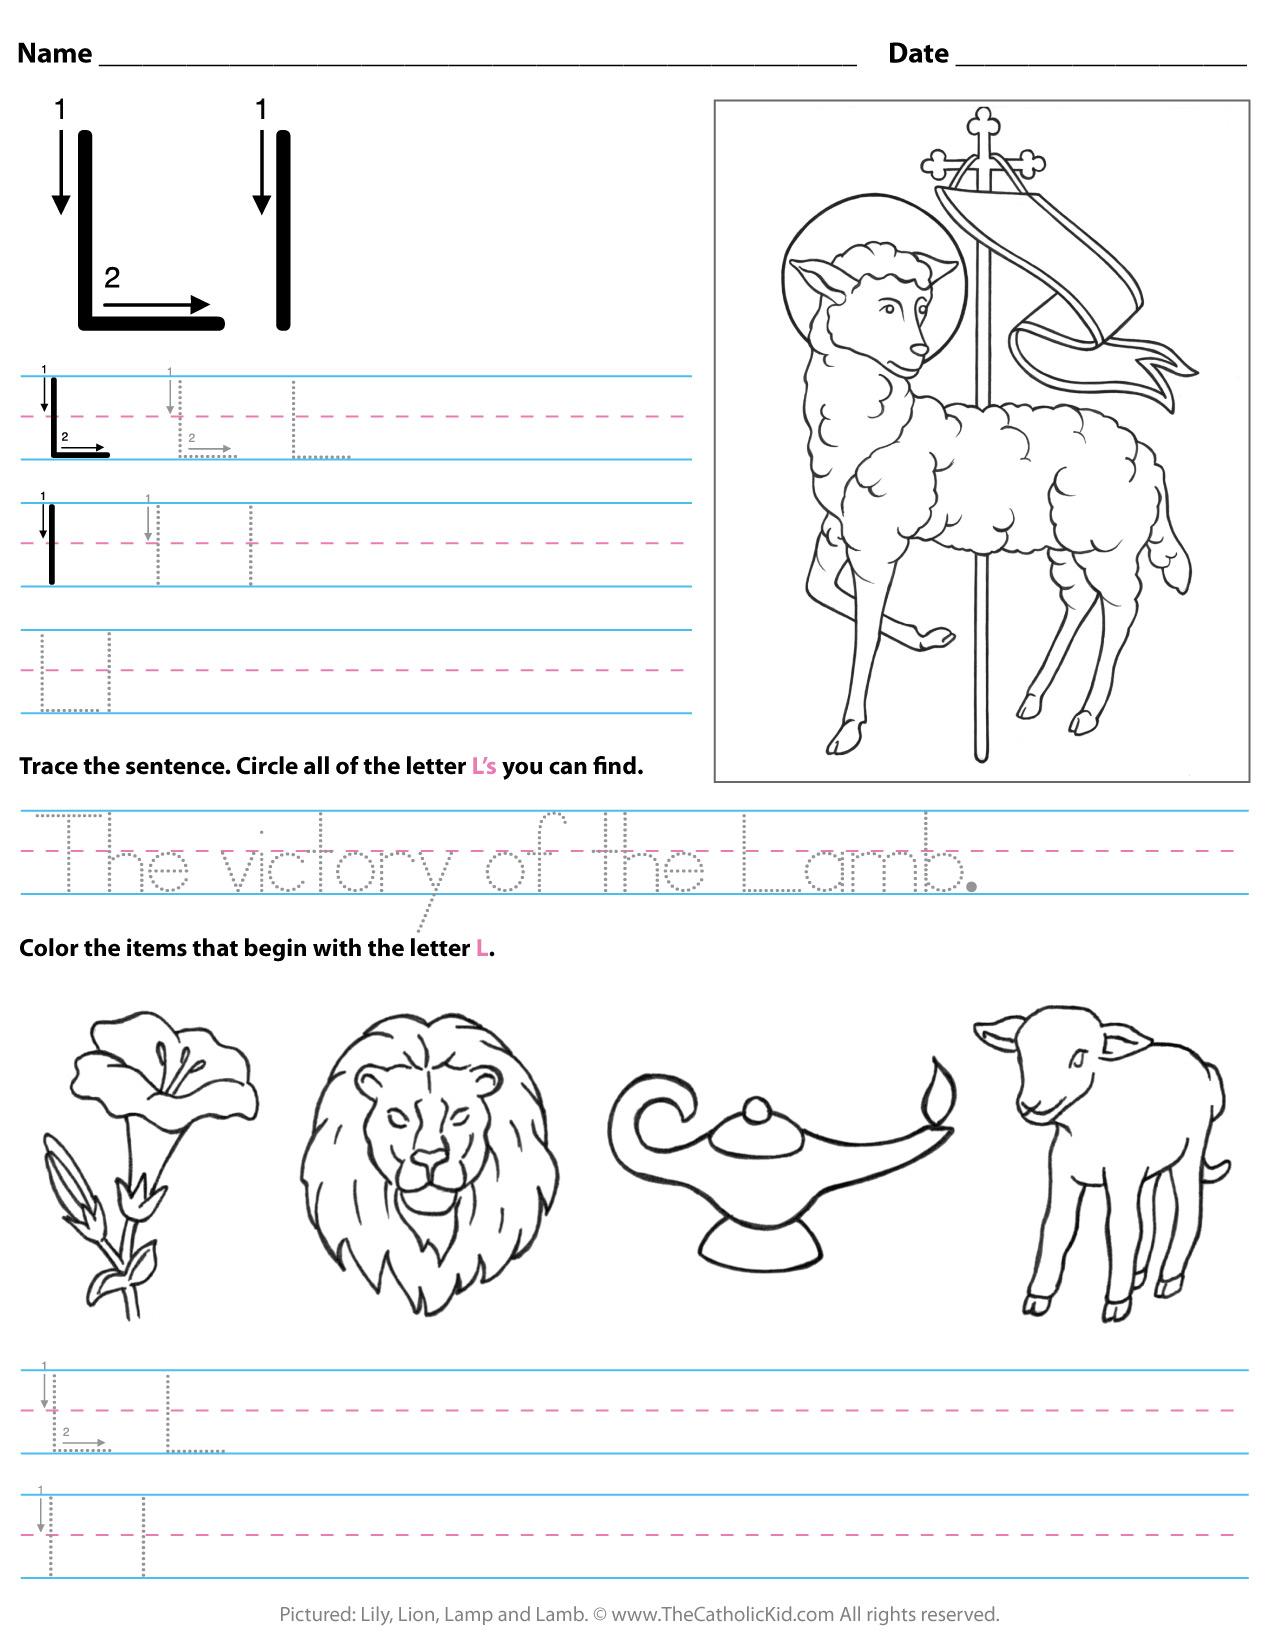 Catholic Alphabet Letter L Worksheet Preschool Kindergarten pertaining to Tracing Letter L Worksheets For Kindergarten